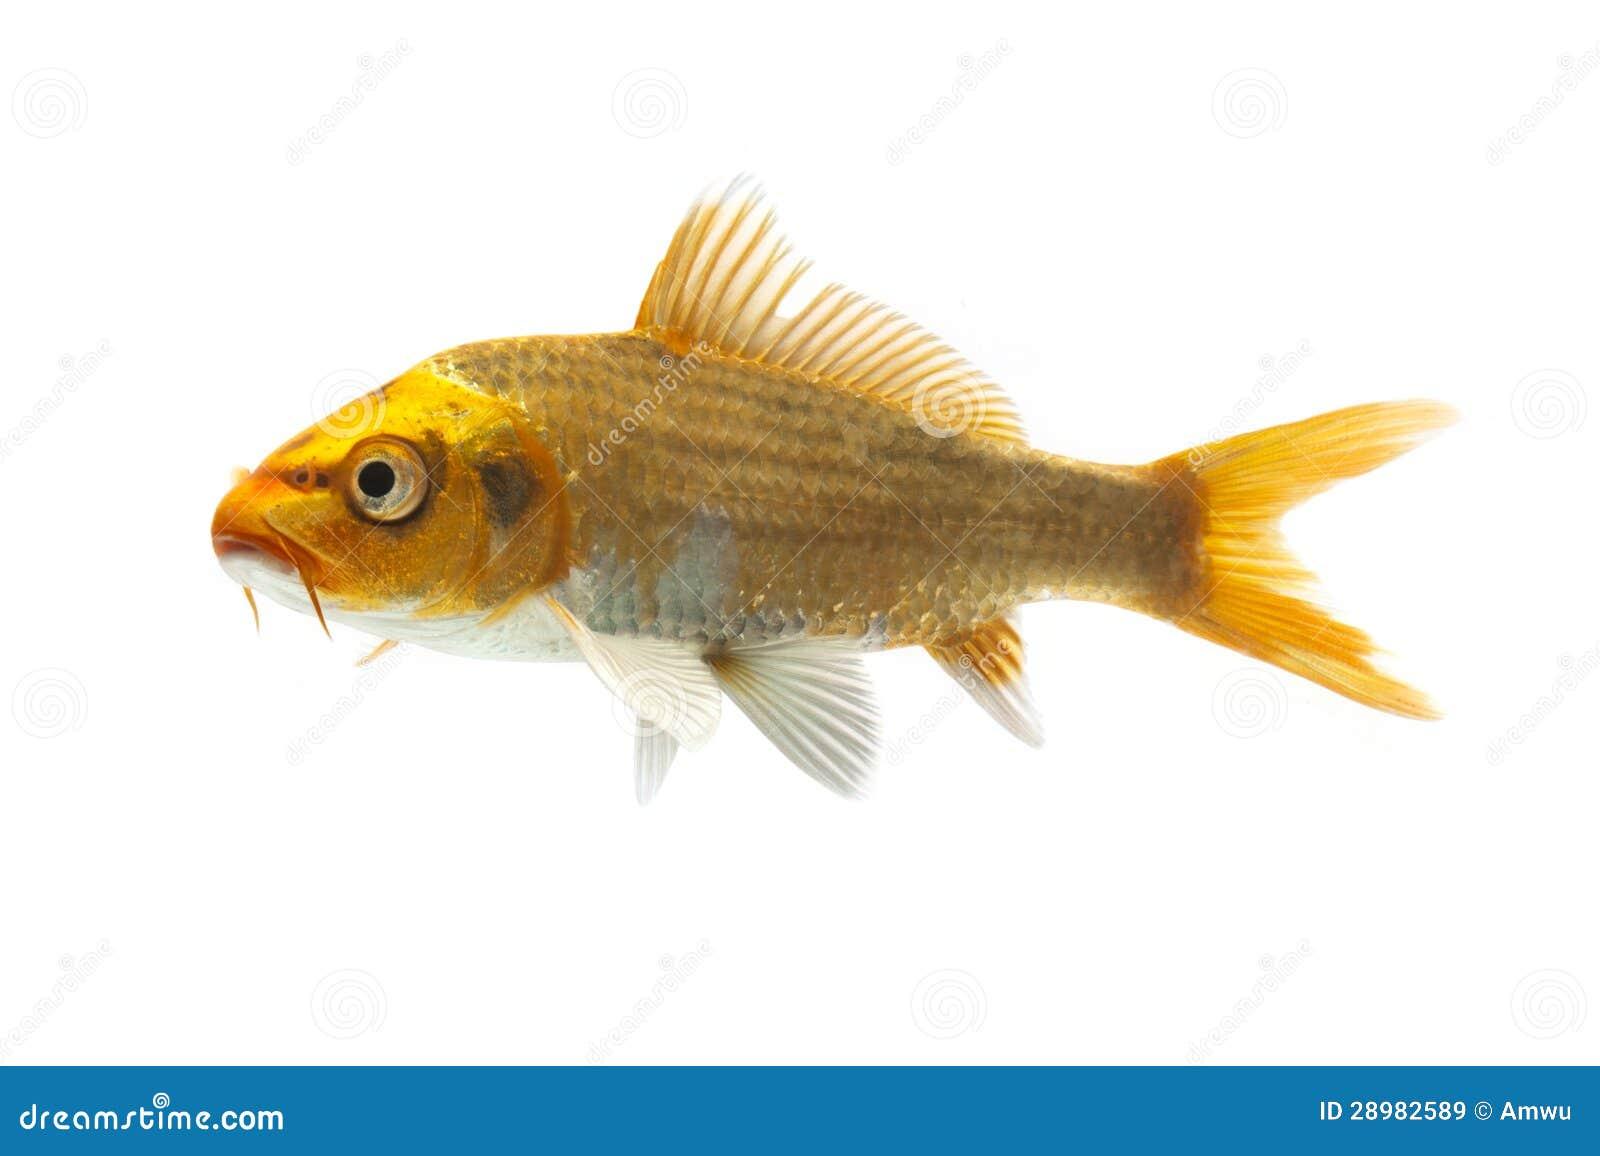 Golden koi fish stock image 29087989 for Koi fish dealers